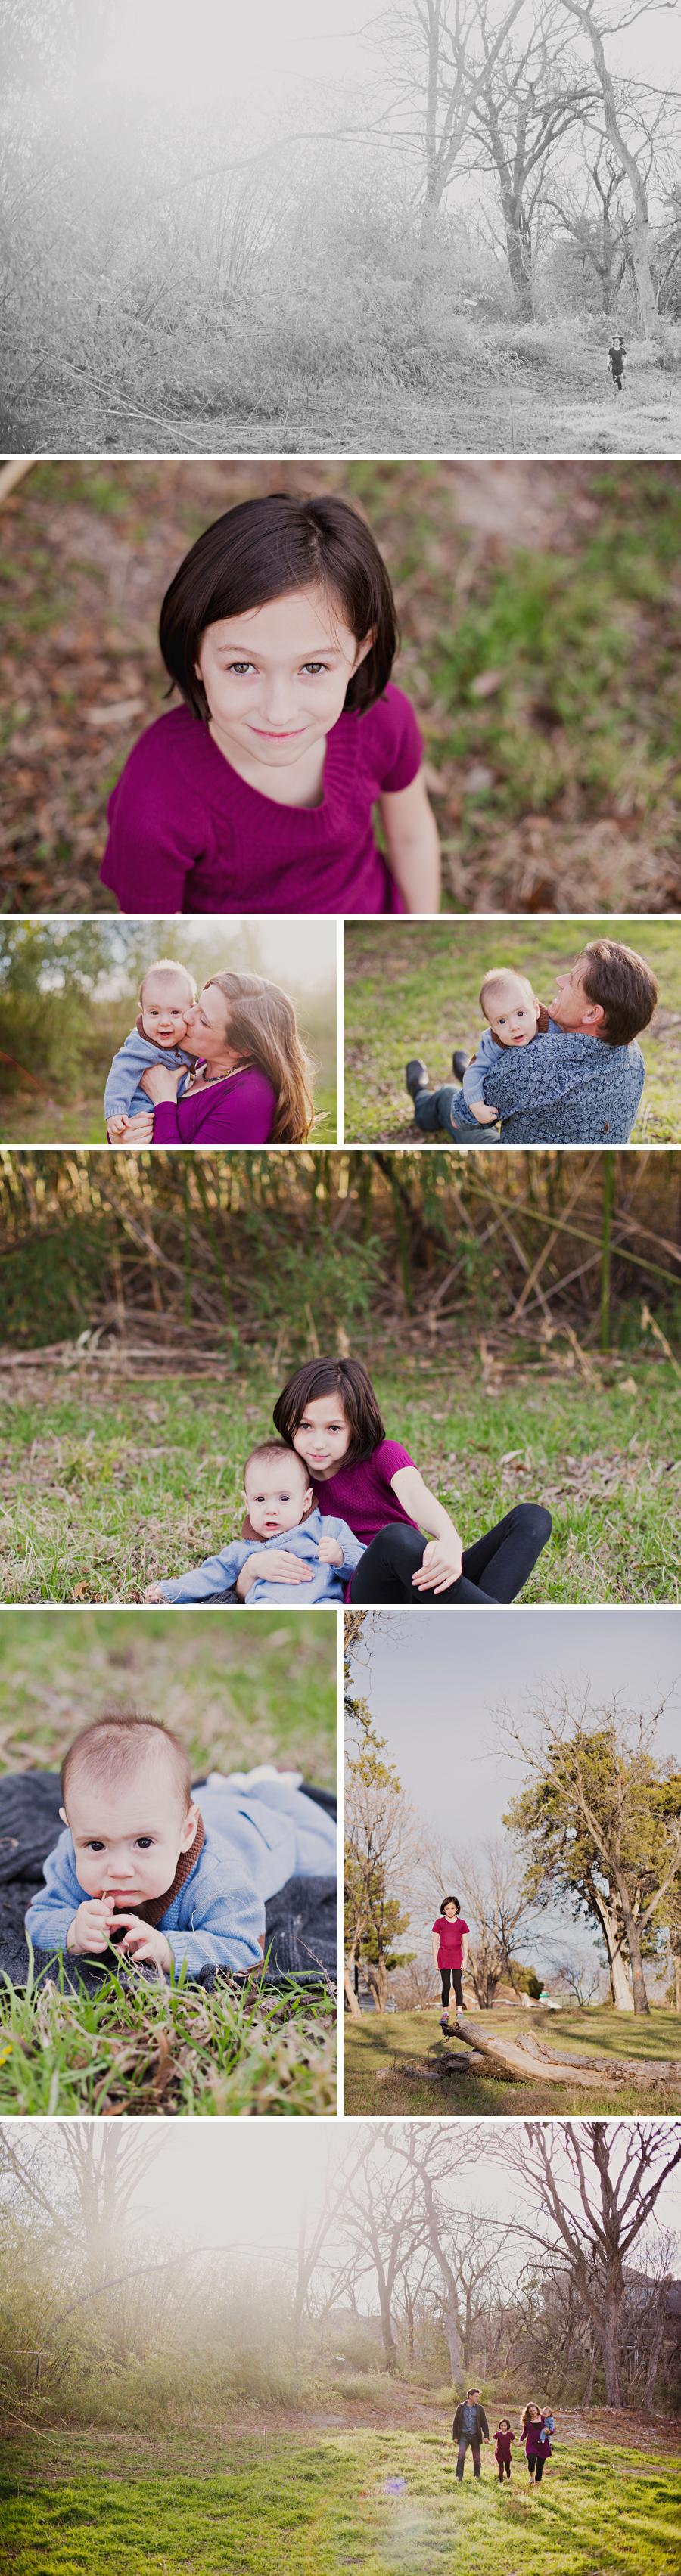 Dallas-Family-Photographerc014